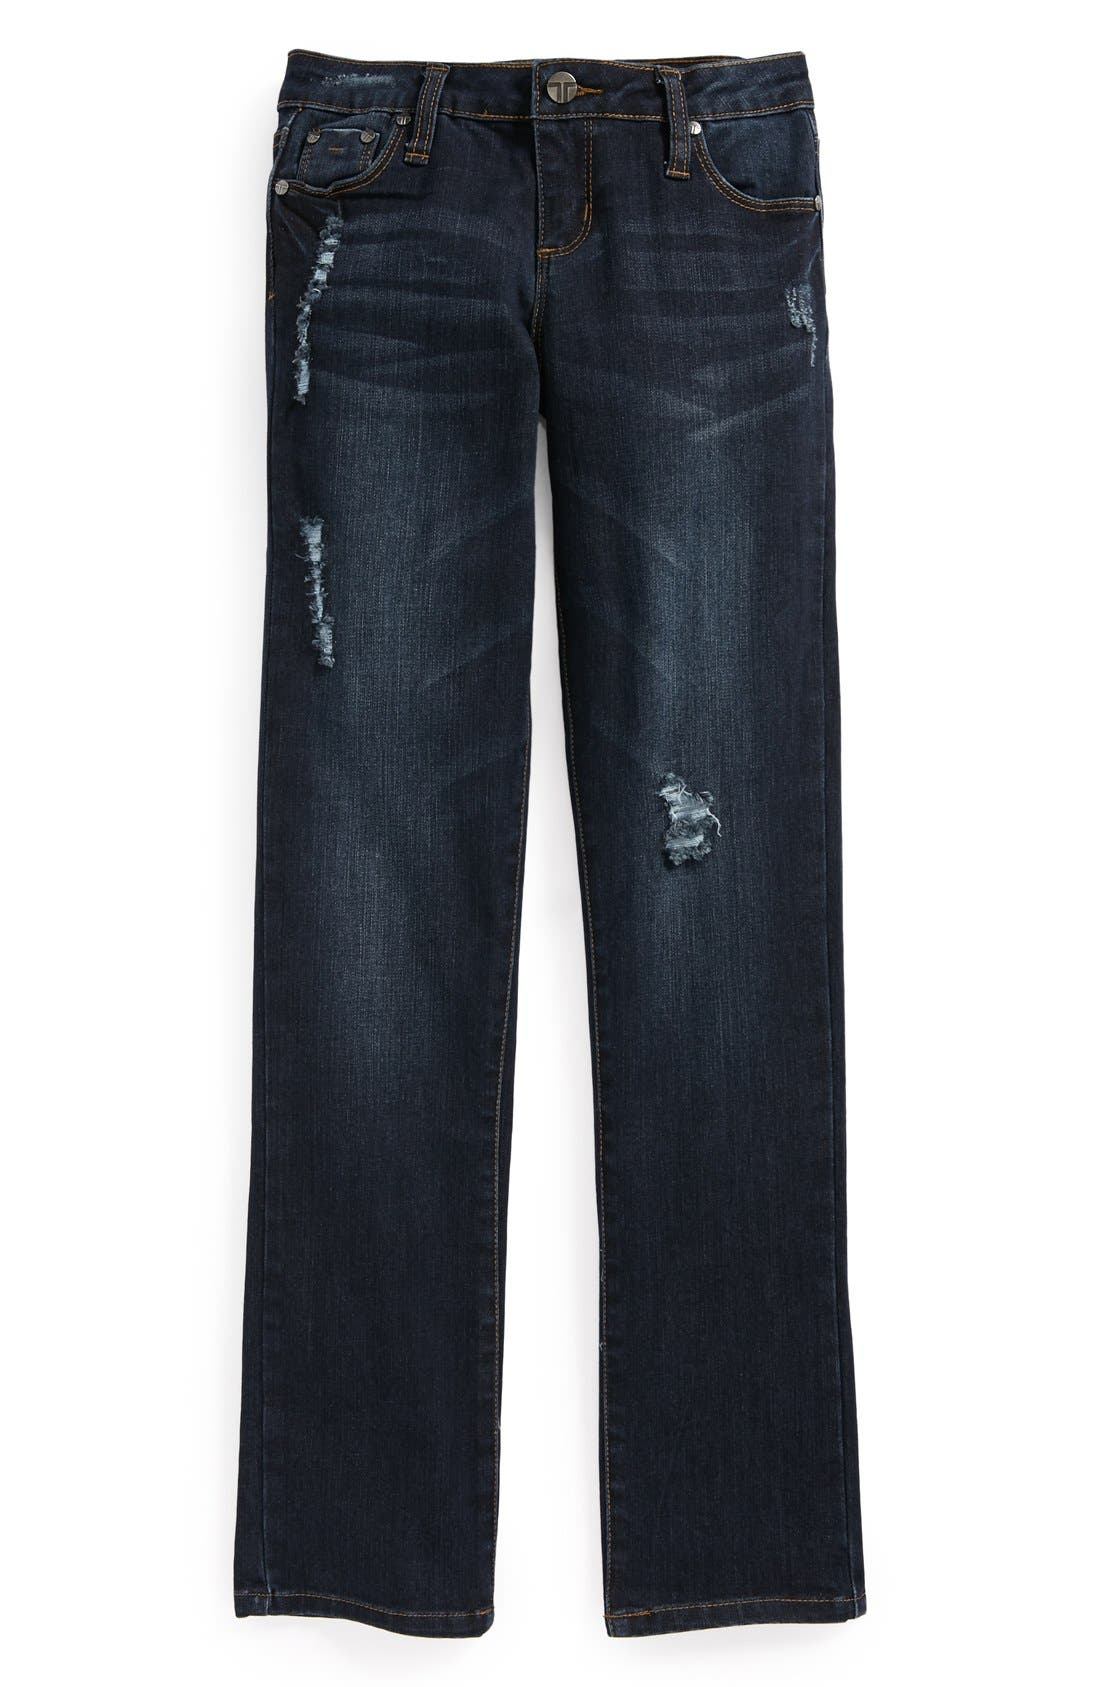 Alternate Image 2  - Tractr Boyfriend Jeans (Big Girls)